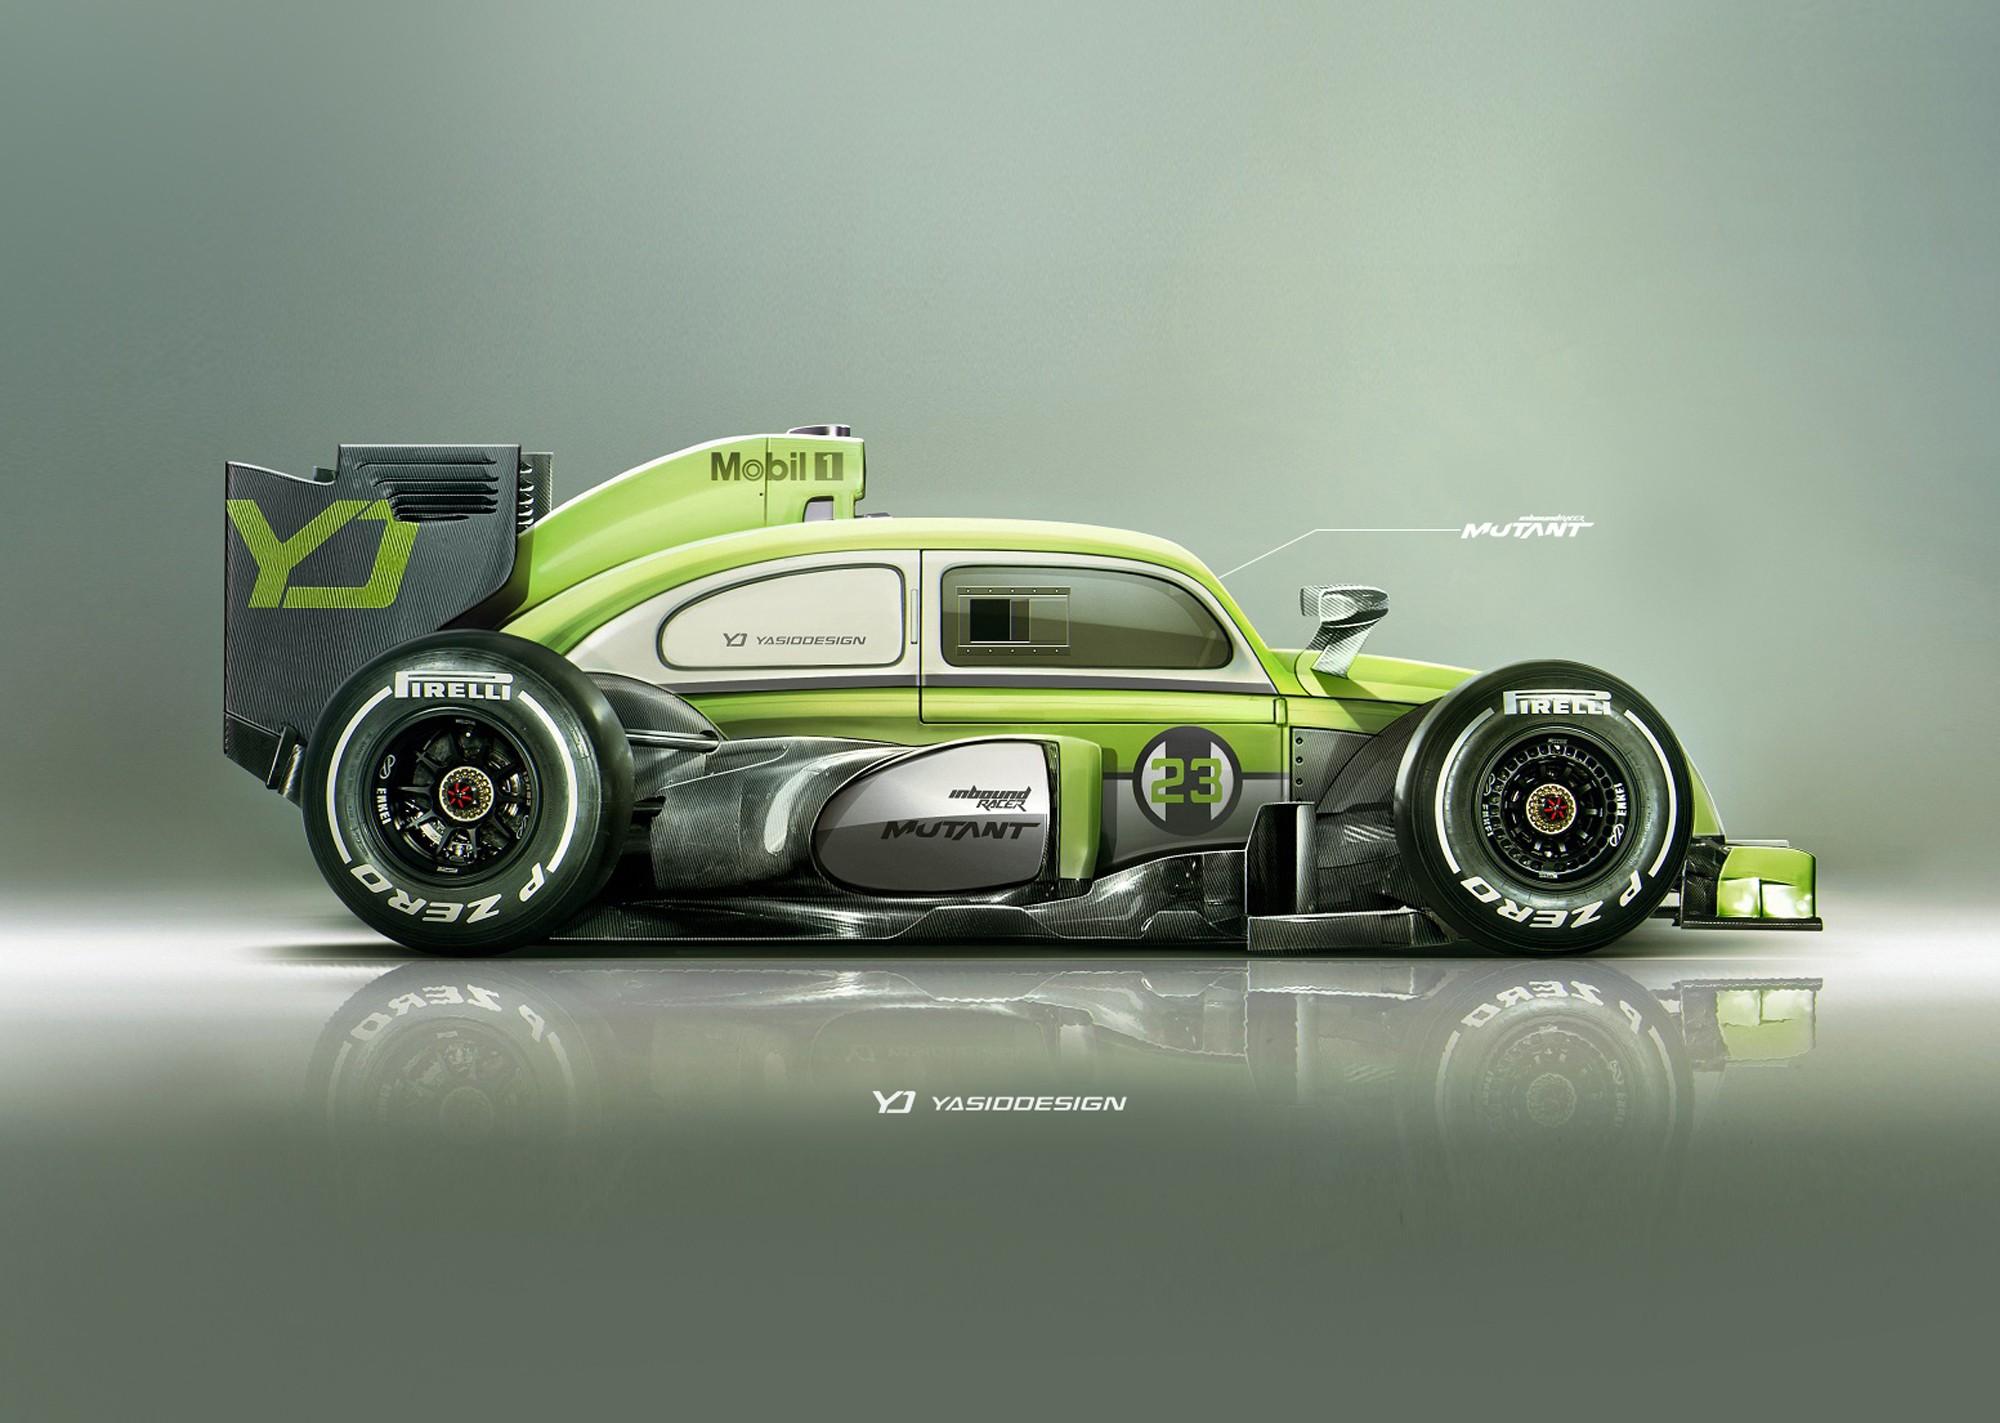 Wallpaper : Race Cars, Render, Artwork, Volkswagen Beetle, Porsche, Formula  1, Sports Car, YASIDDESIGN, Pirelli, Mobil 1, Supercar, Land Vehicle, ...